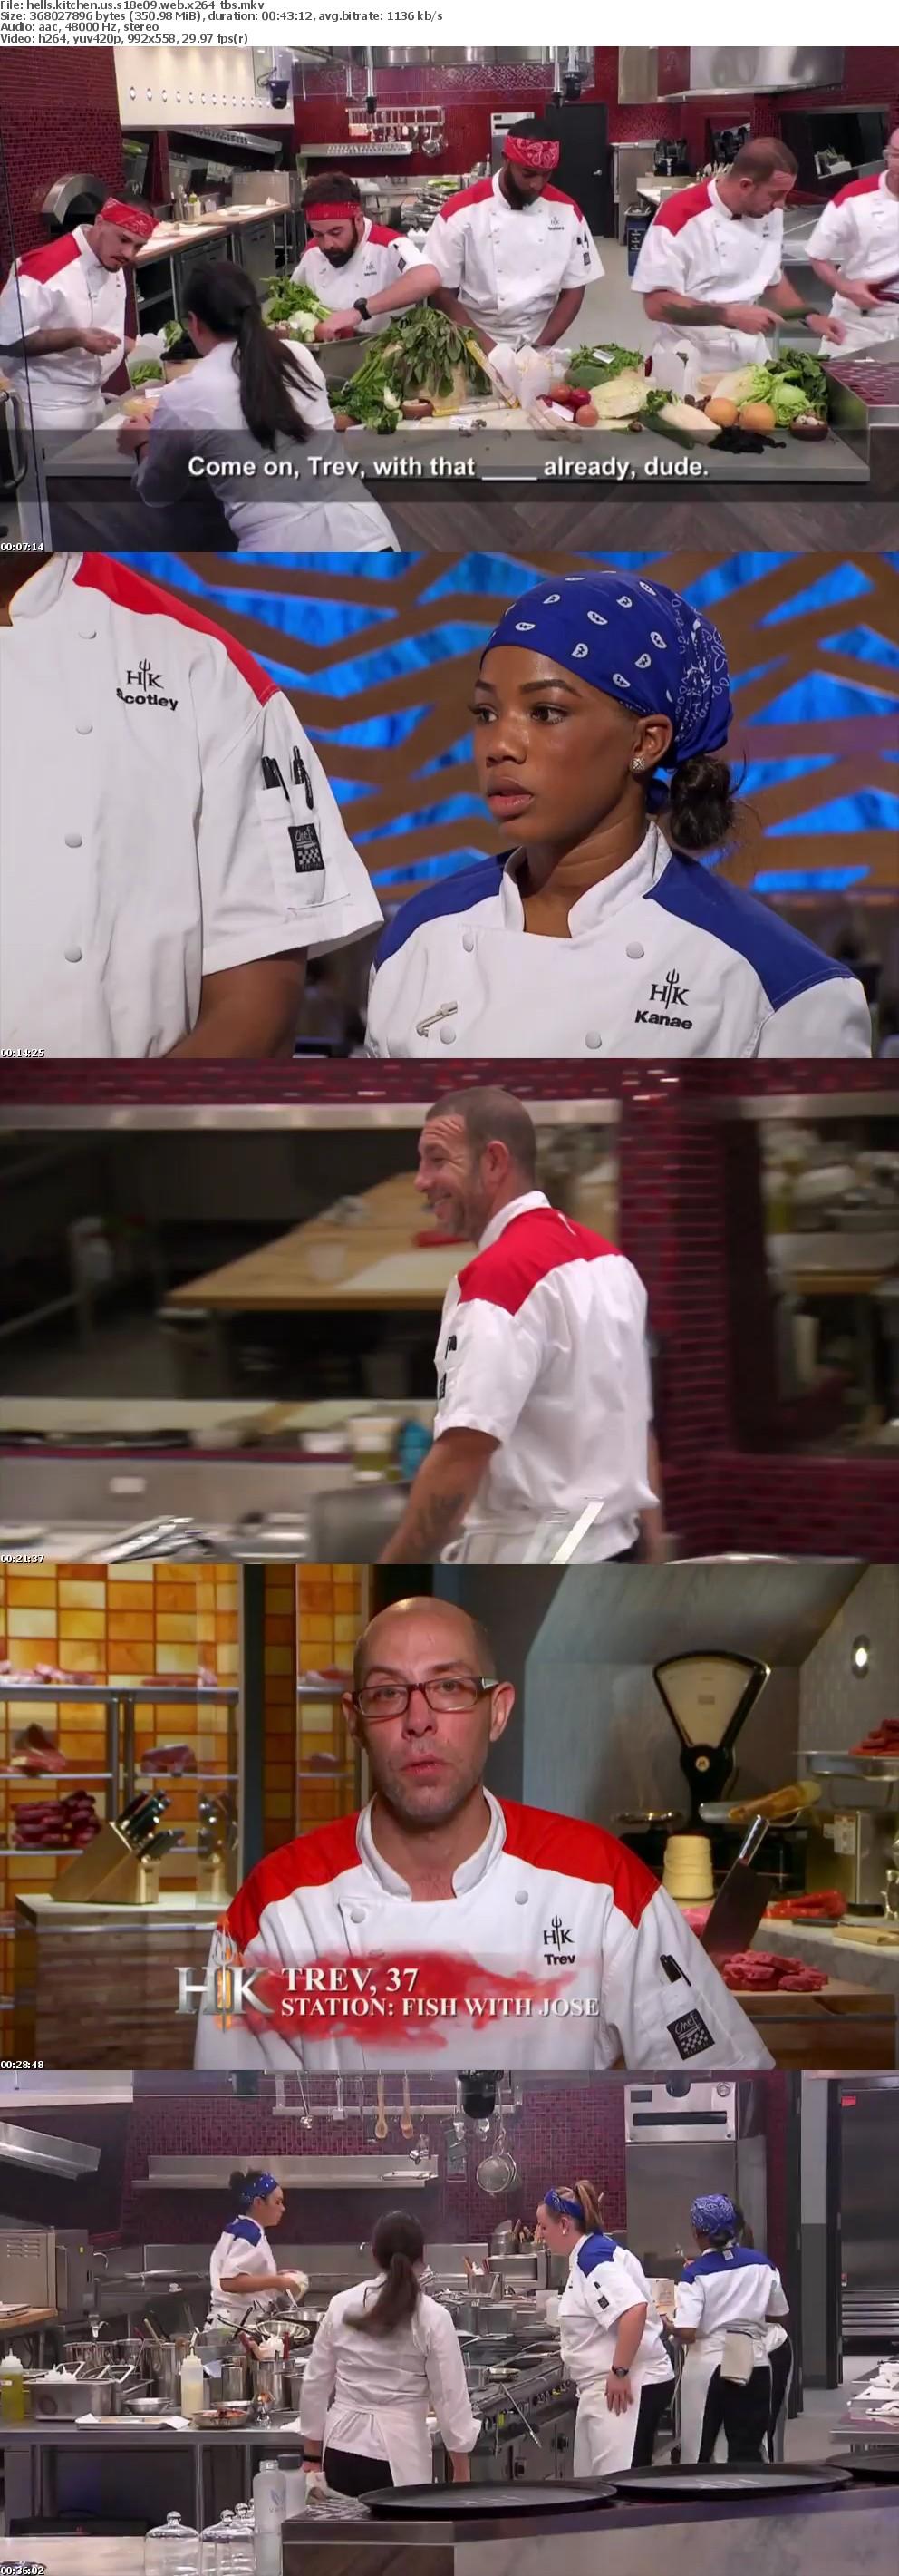 Hells Kitchen US S18E09 WEB x264-TBS